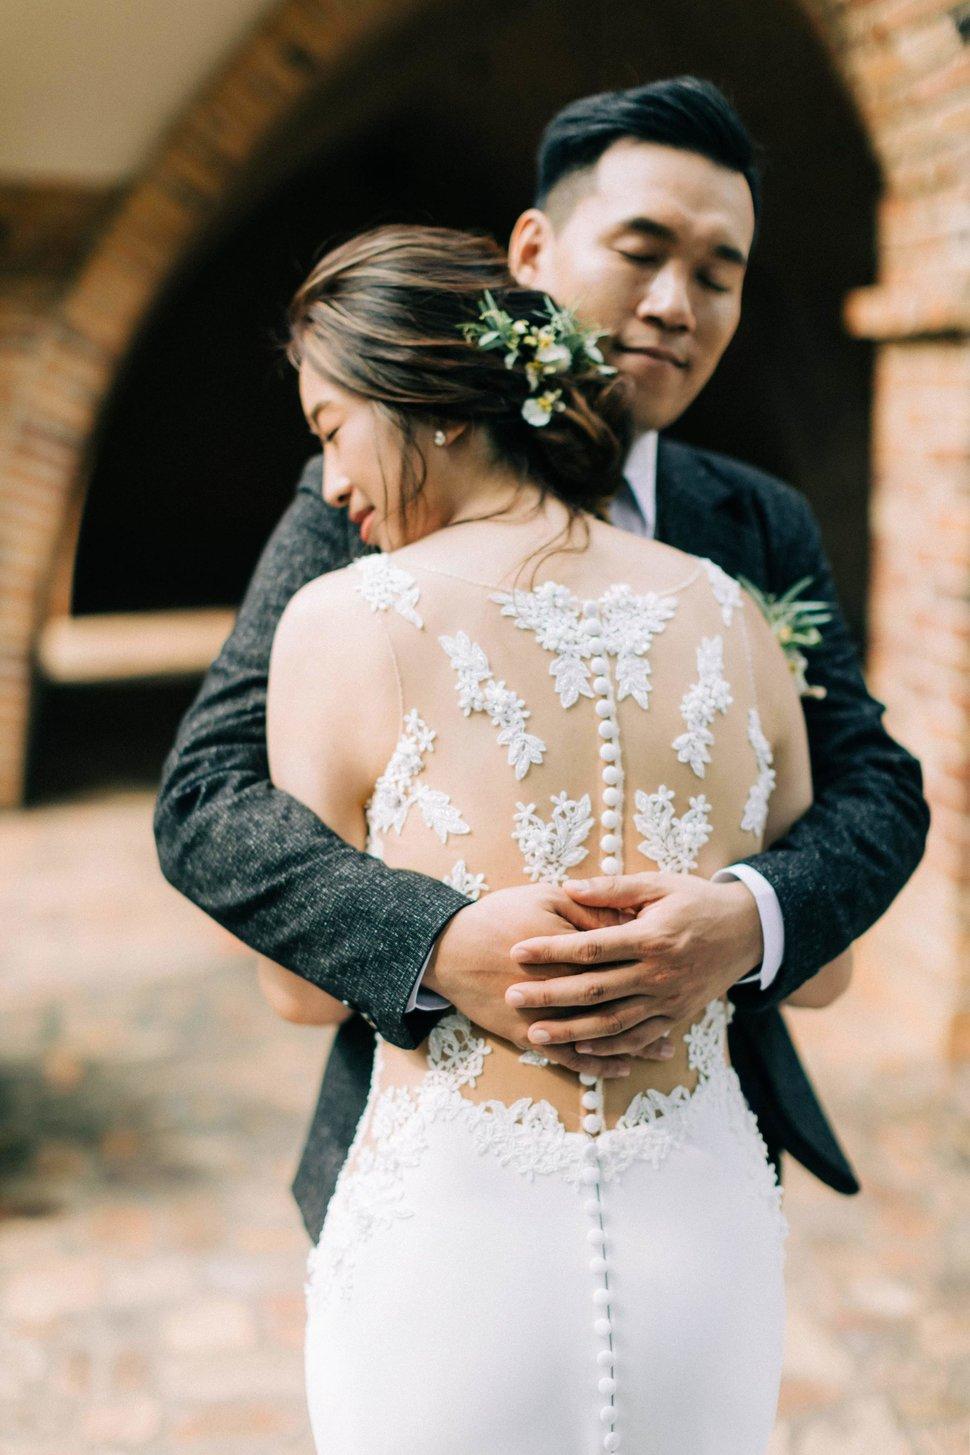 AG3_6704A - Cradle Wedding搖籃手工婚紗《結婚吧》